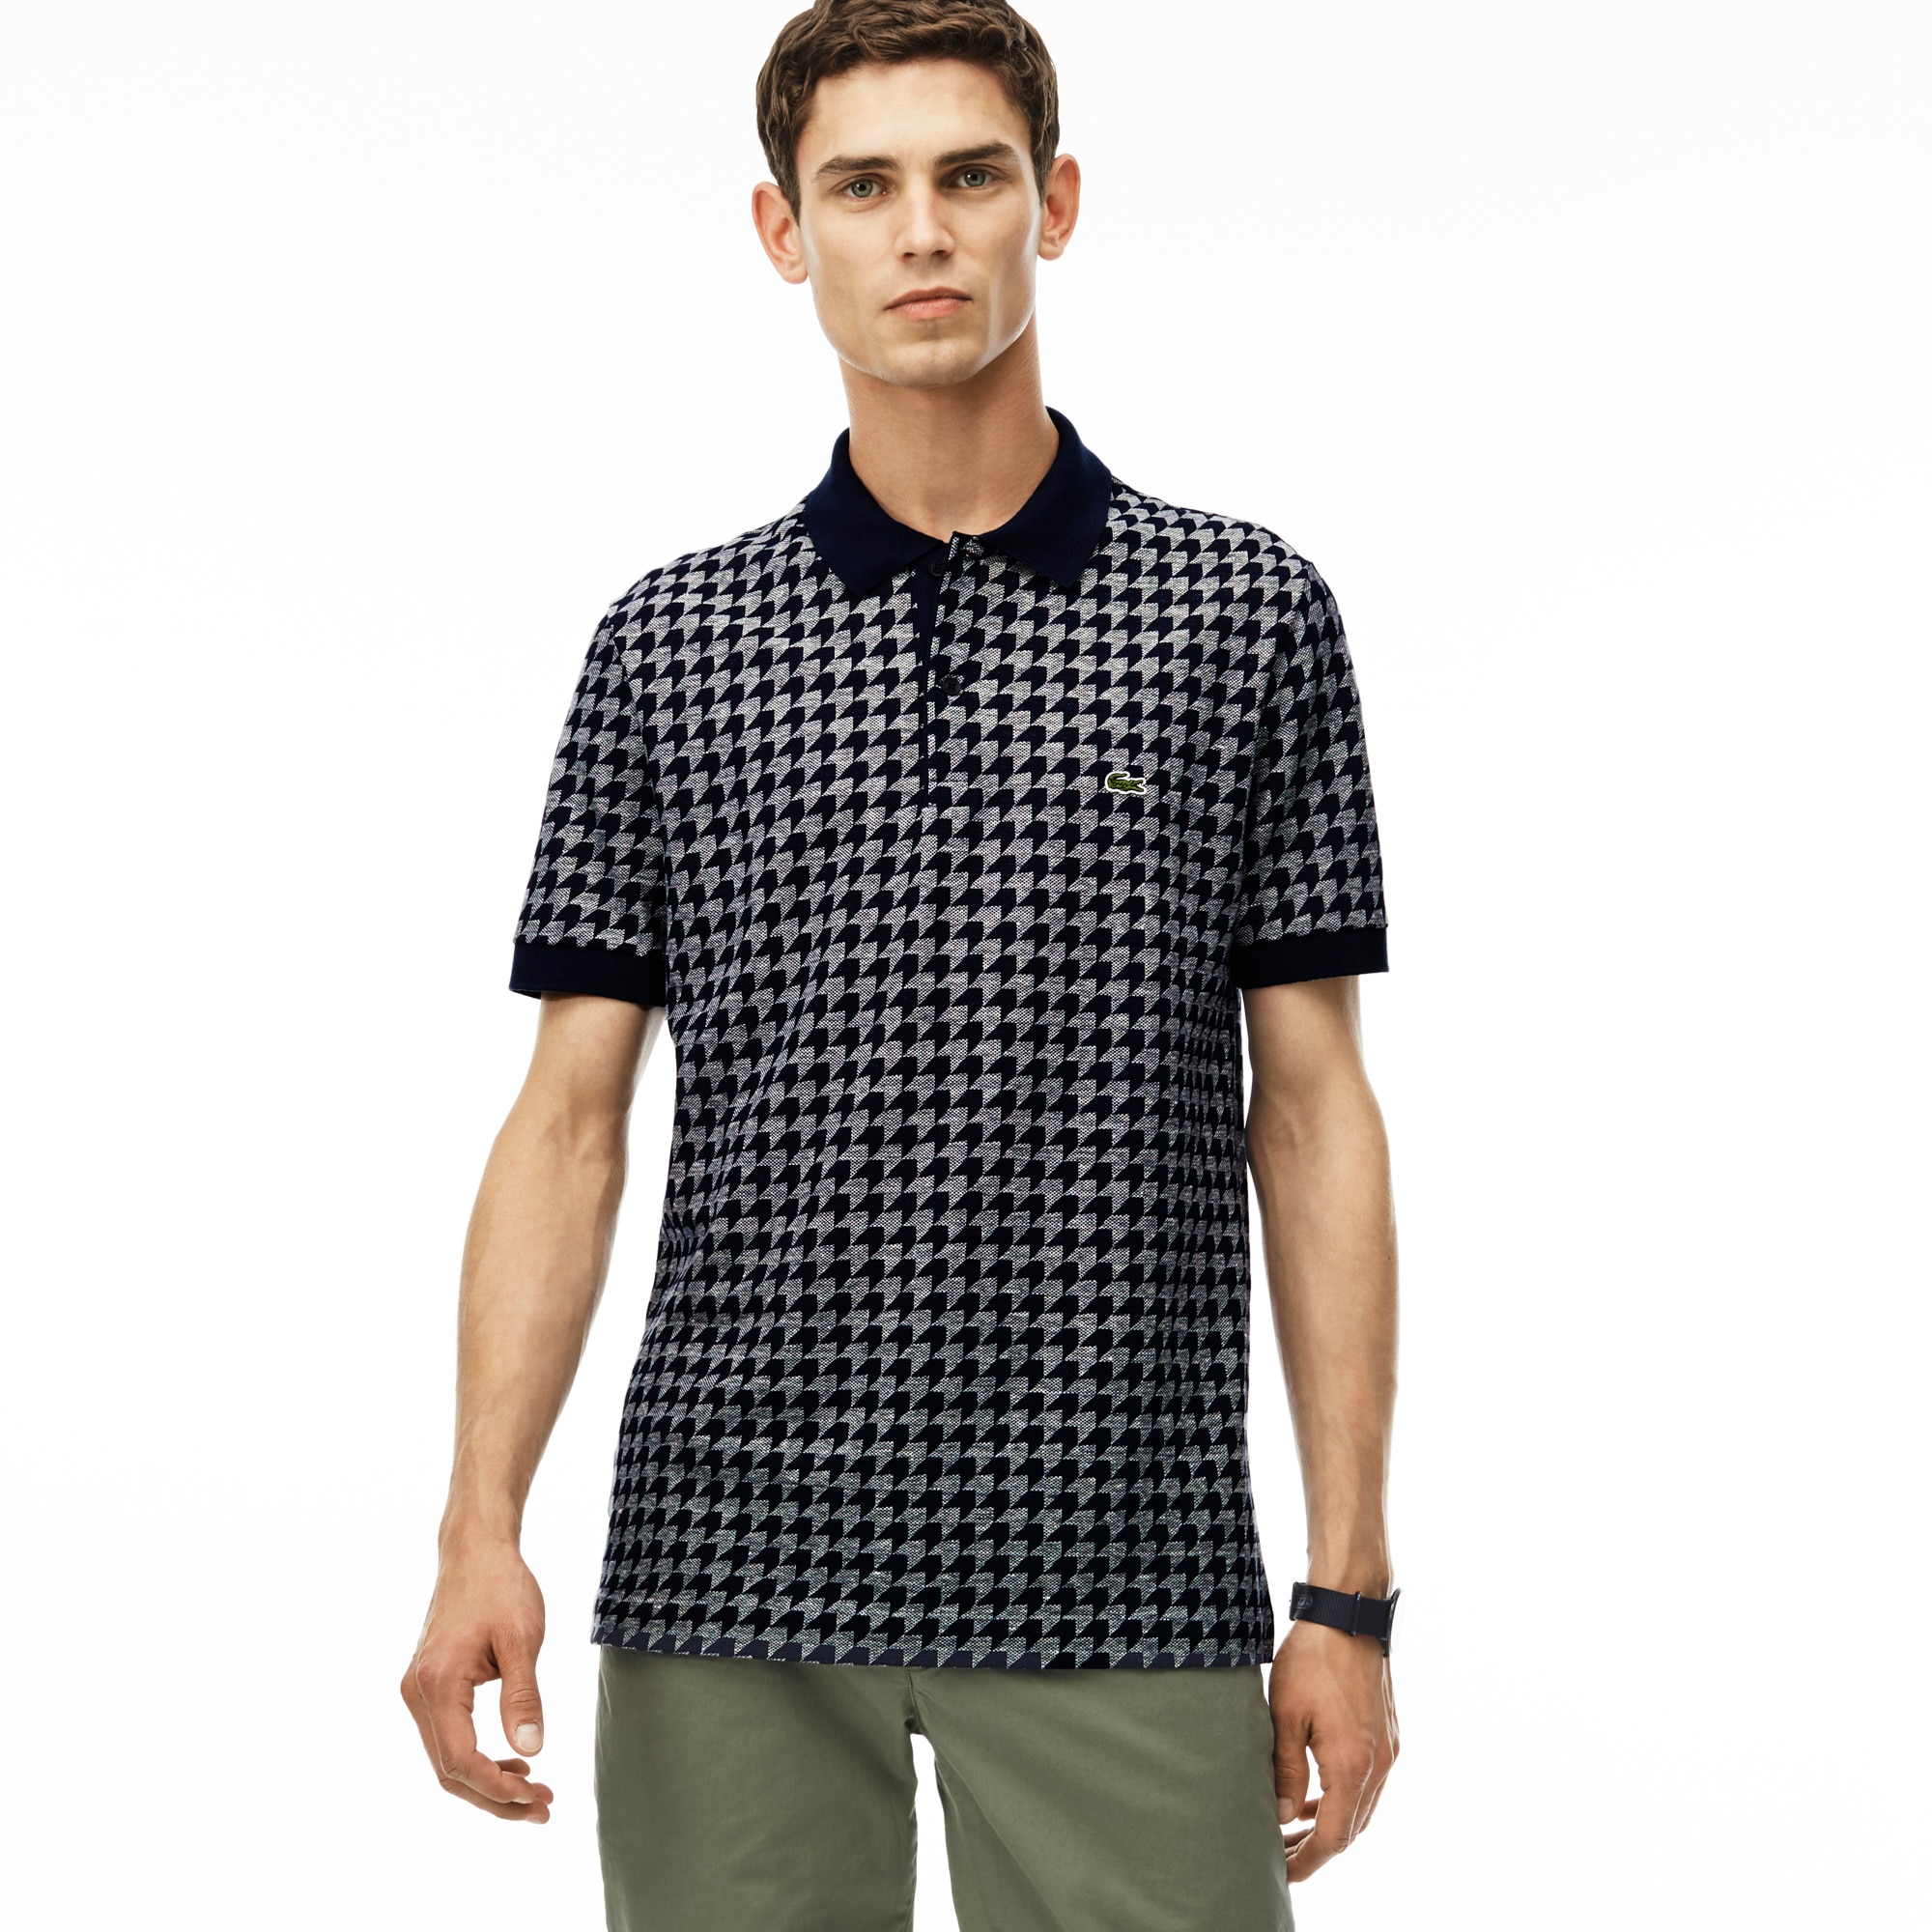 Men's Regular Fit Piqué Polo Houndstooth Print Caviar Shirt